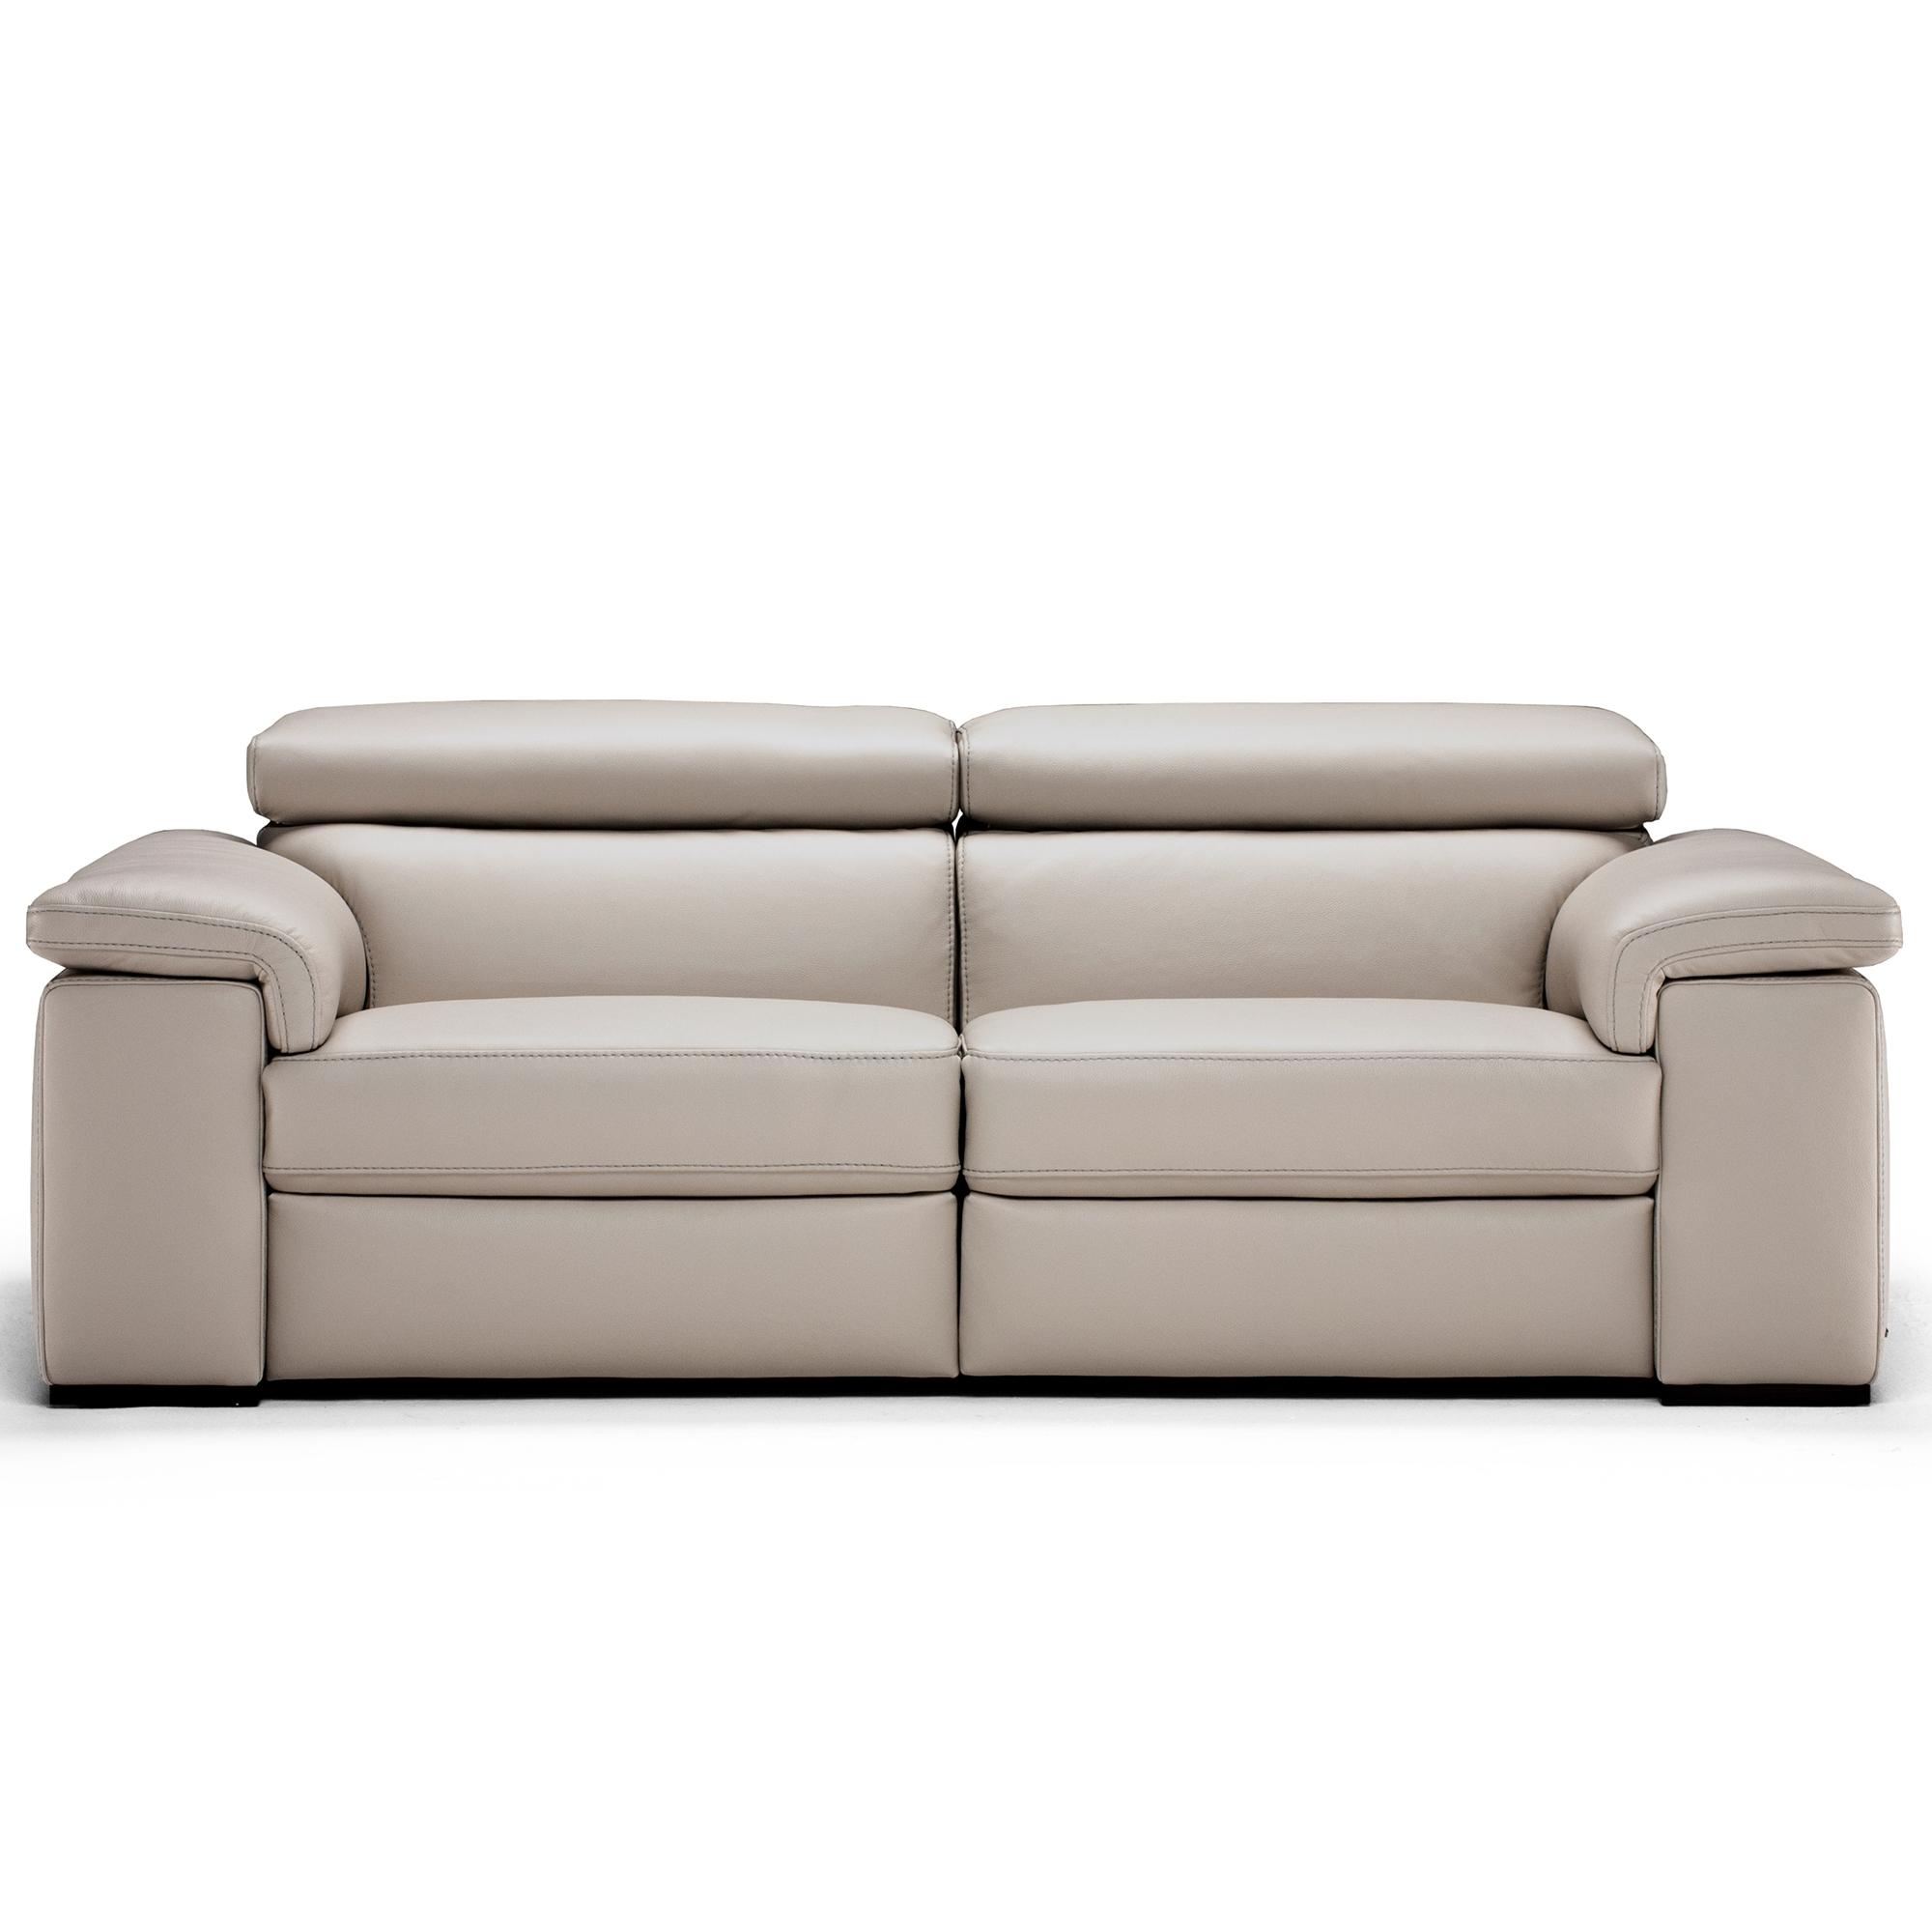 Captivating Natuzzi Editions Sardinia Large Sofa